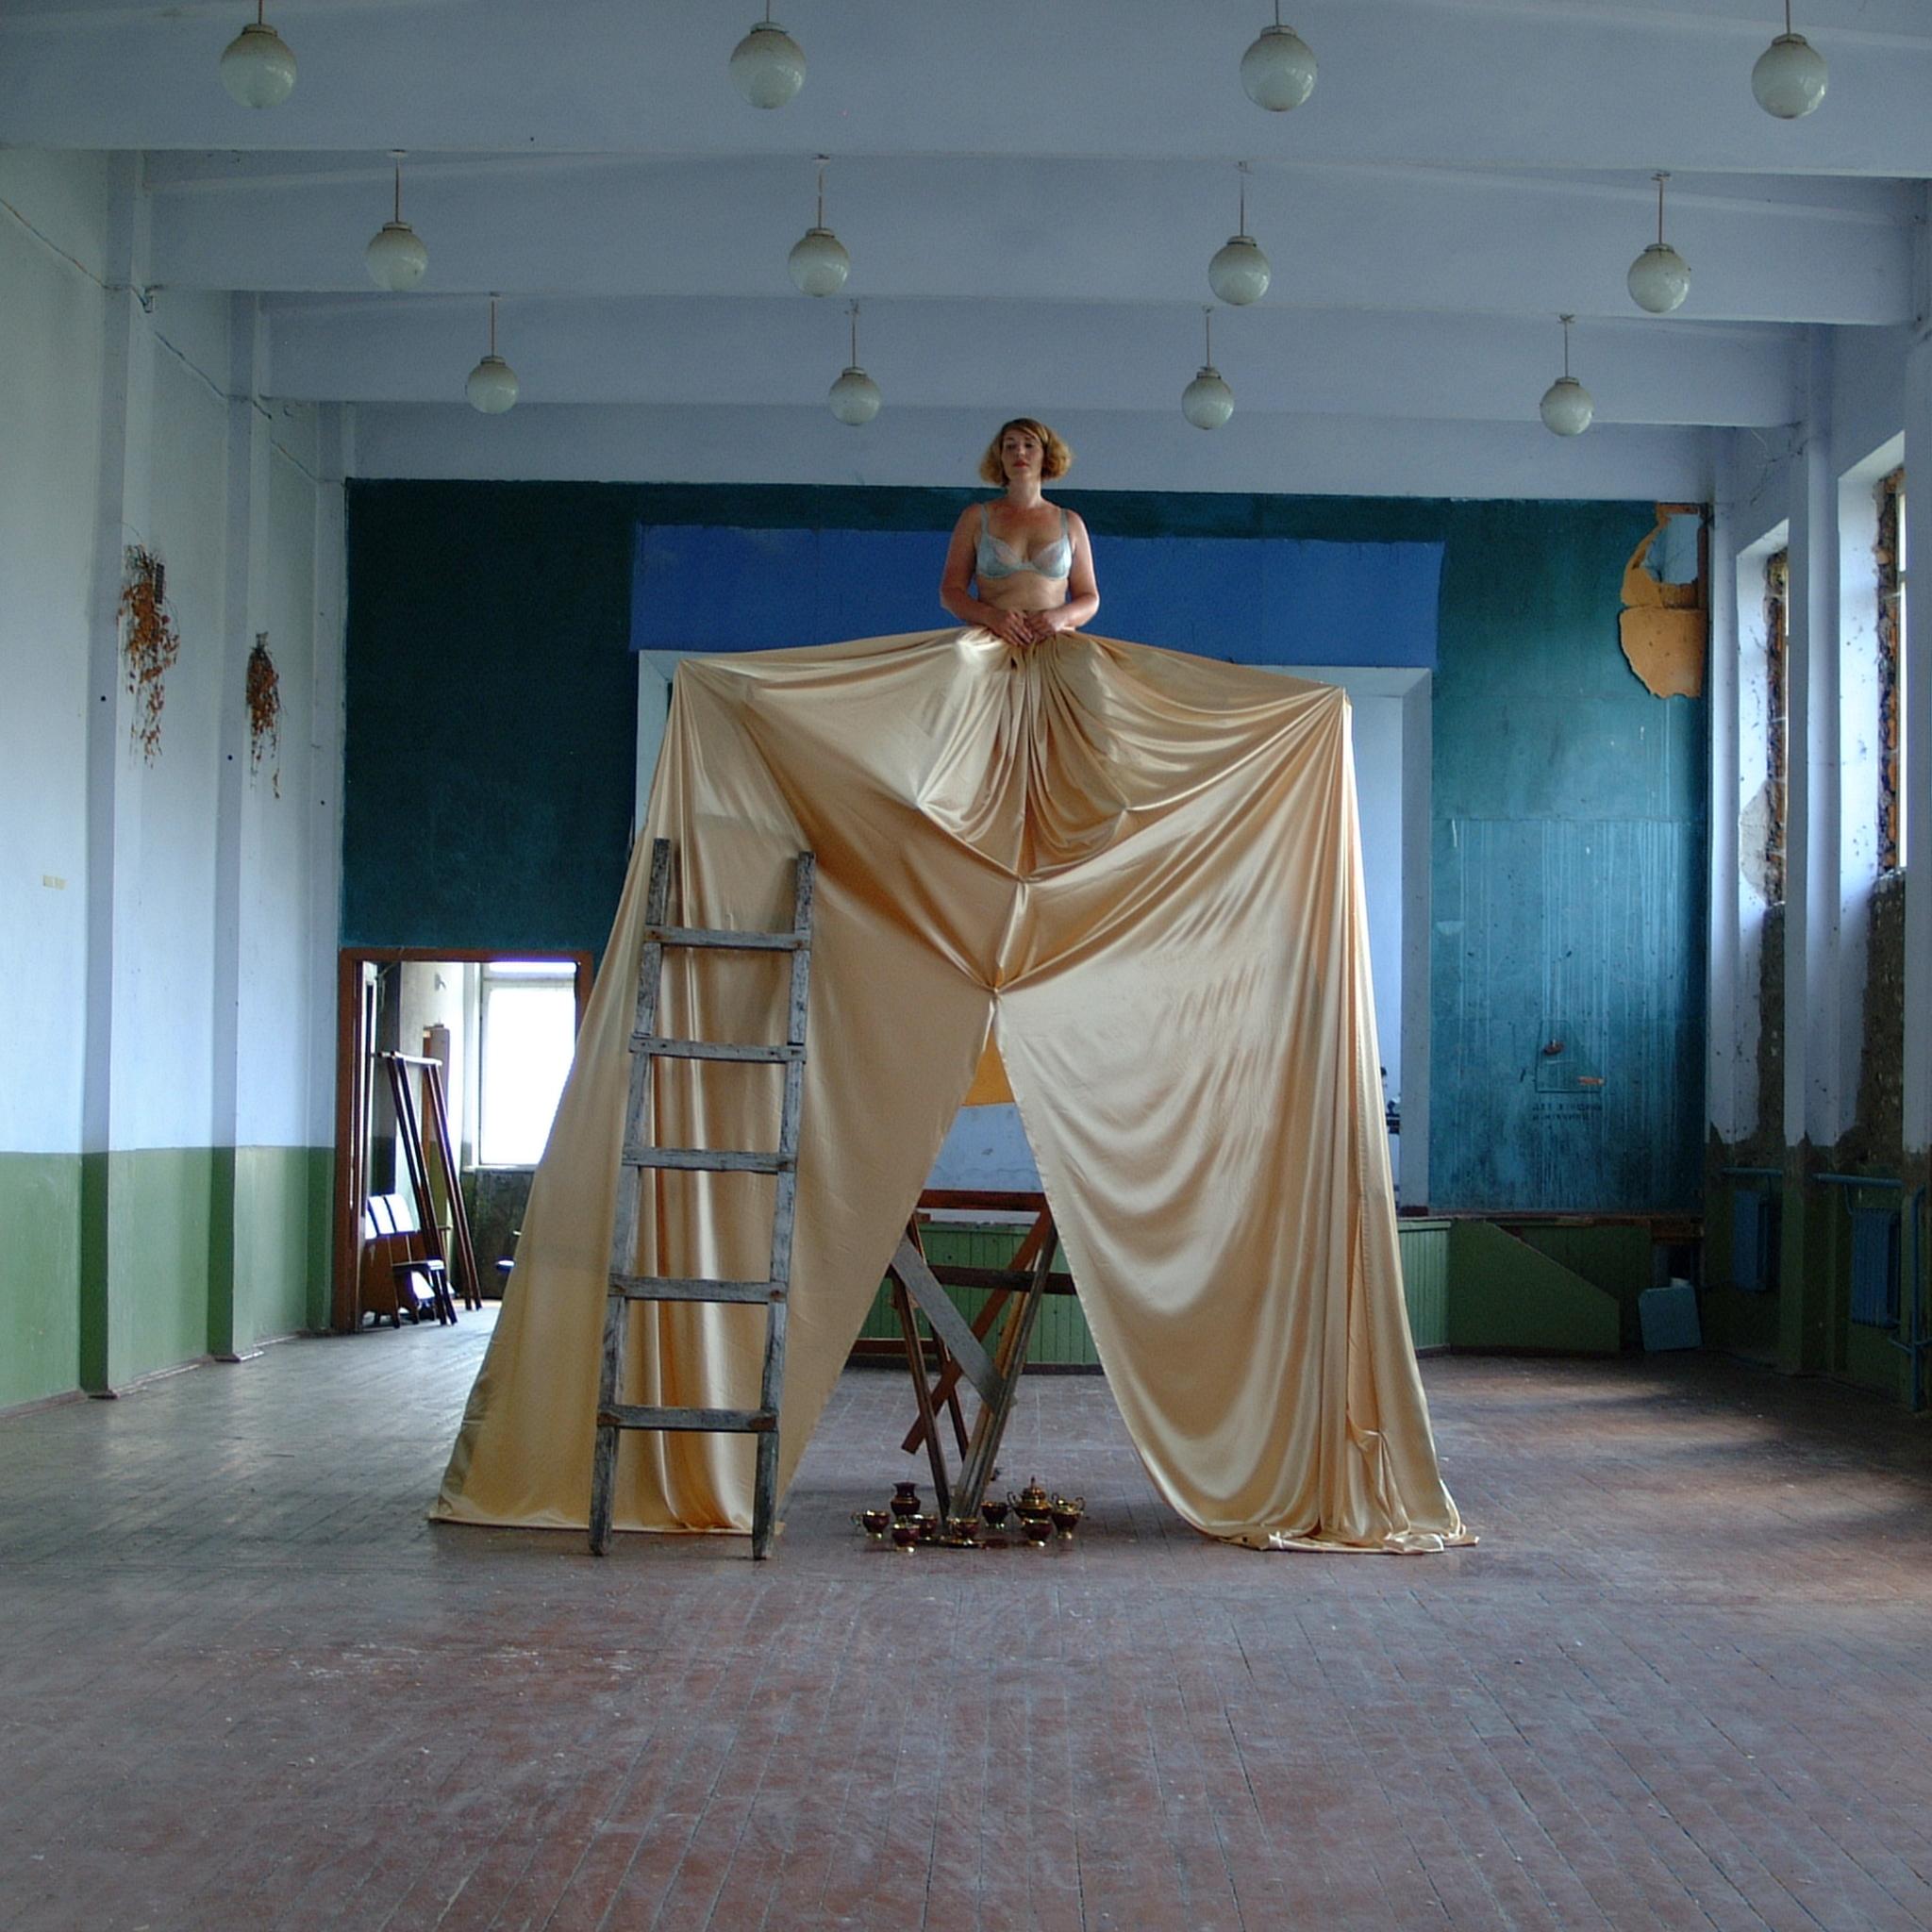 Shiryaevo IX International Biennale of Contemporary Art